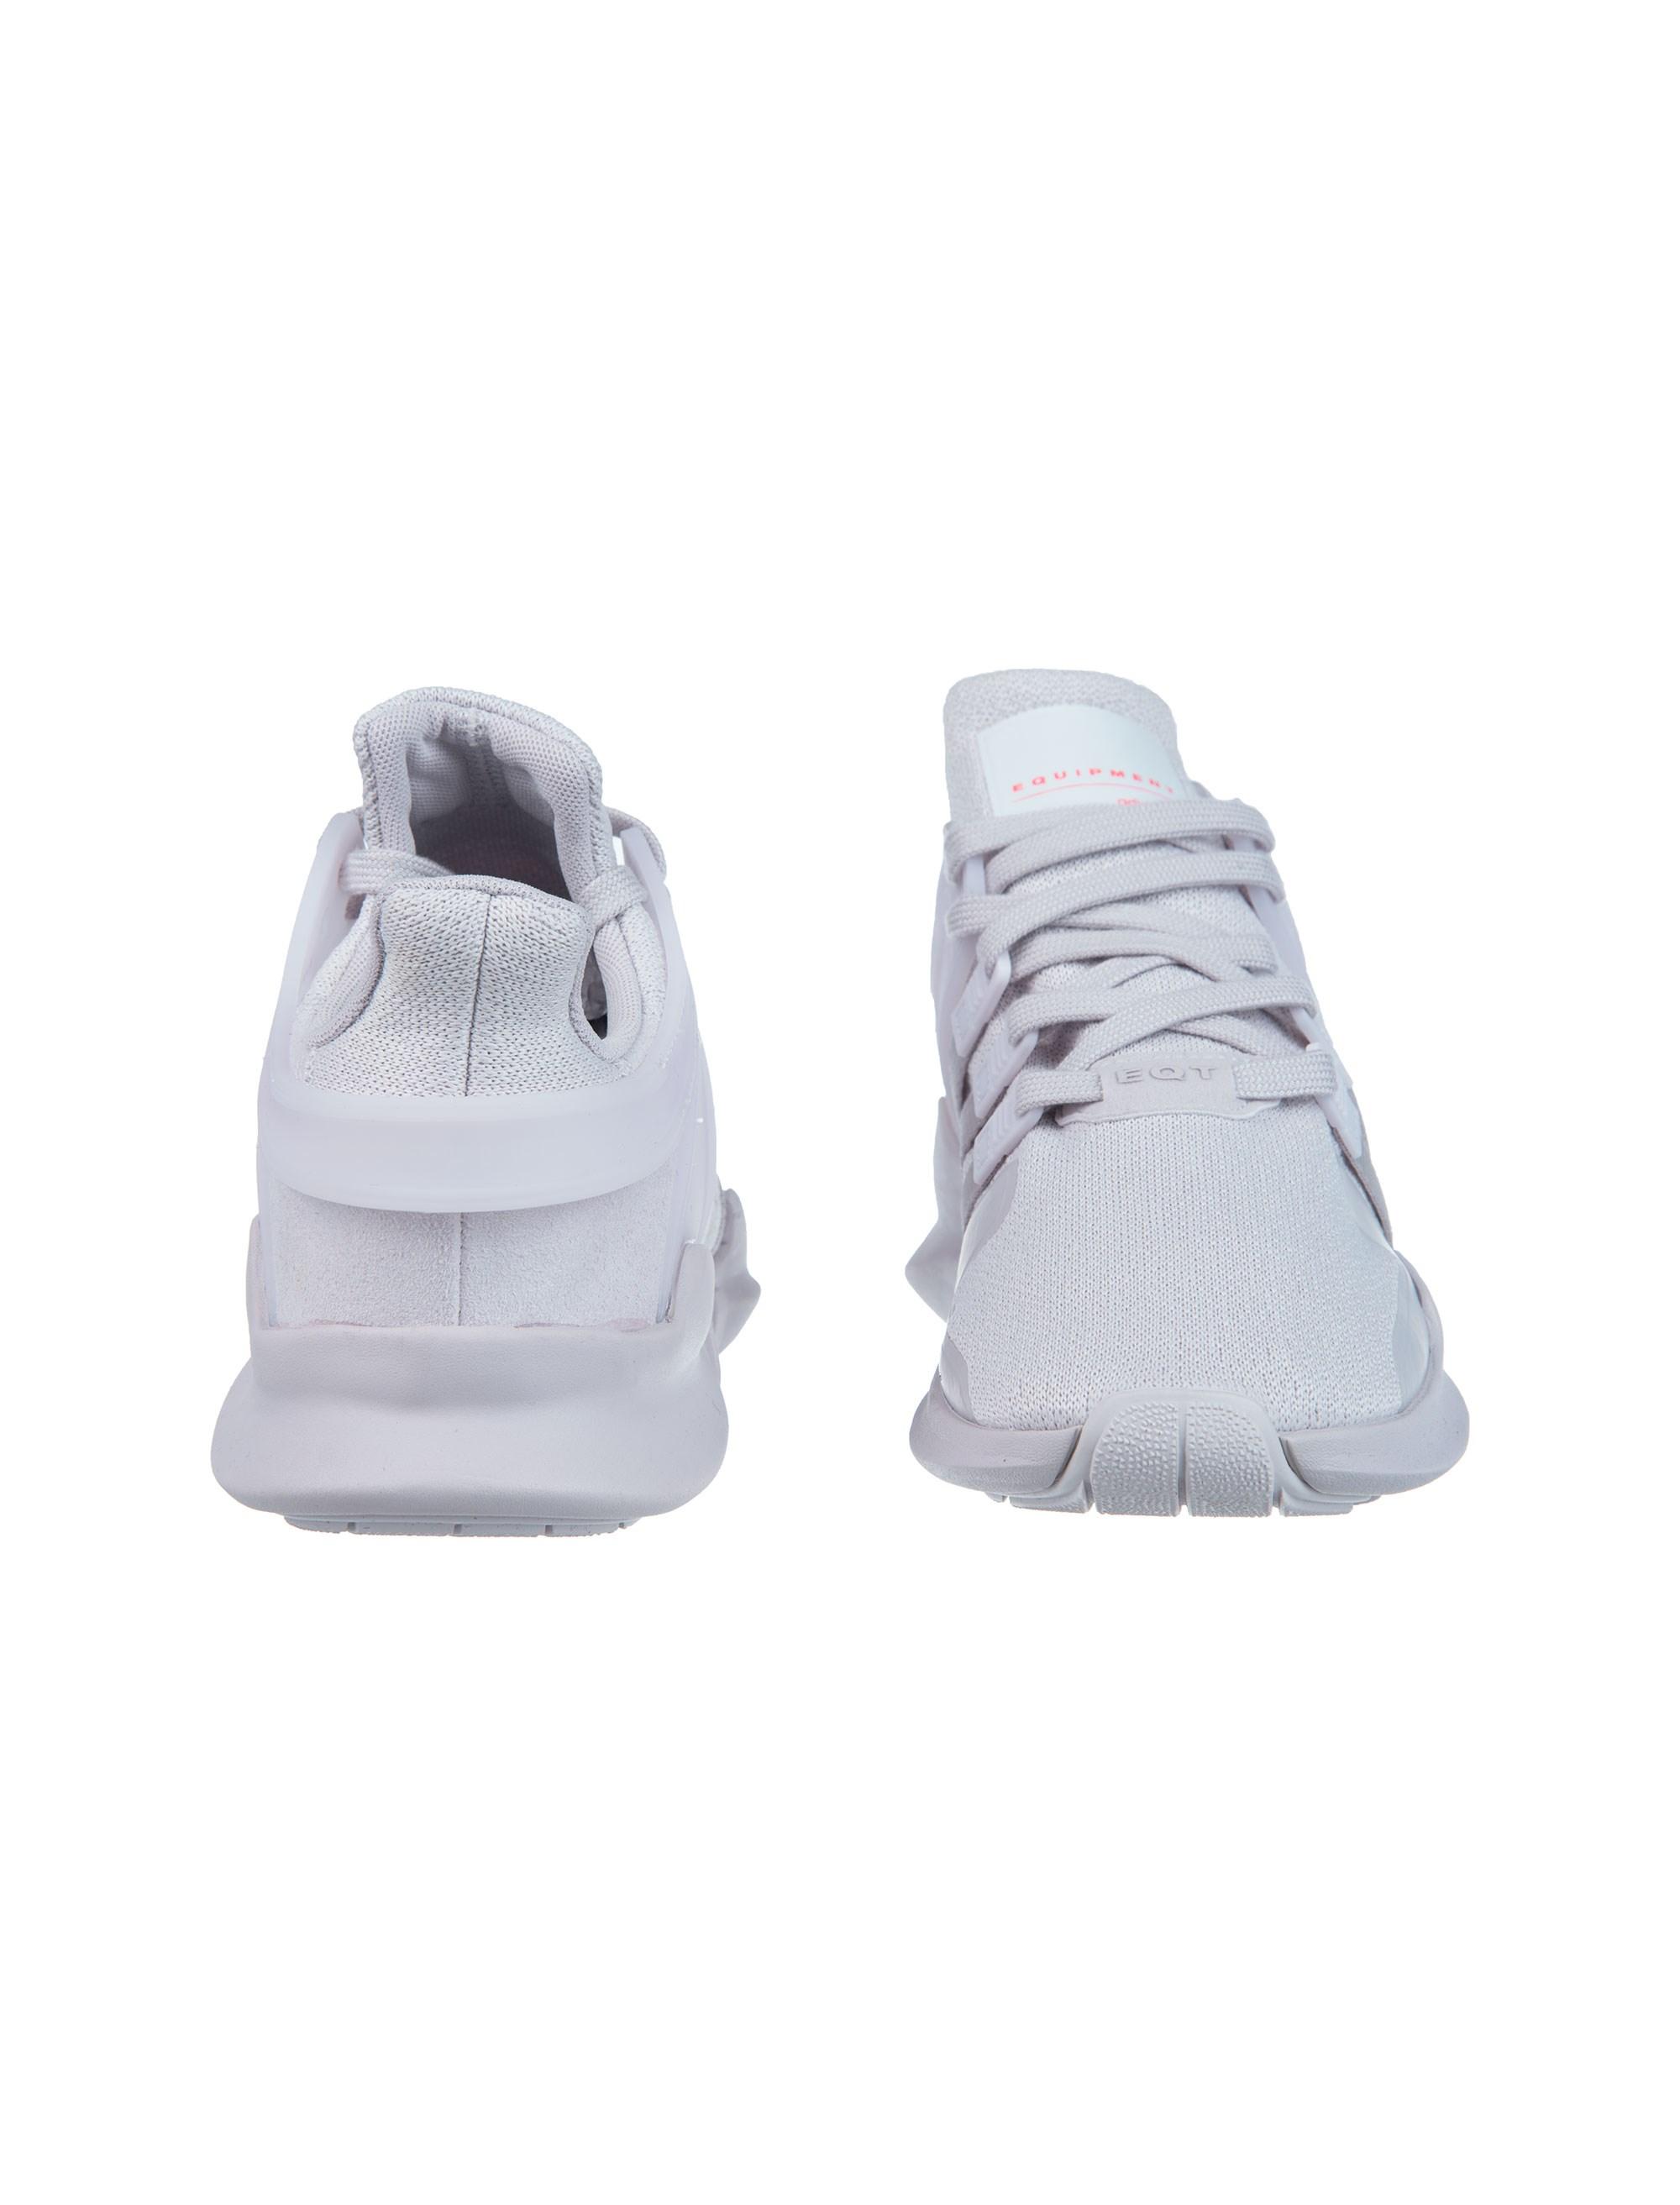 کفش راحتی زنانه آدیداس مدل EQT Support ADV - صورتي - 4